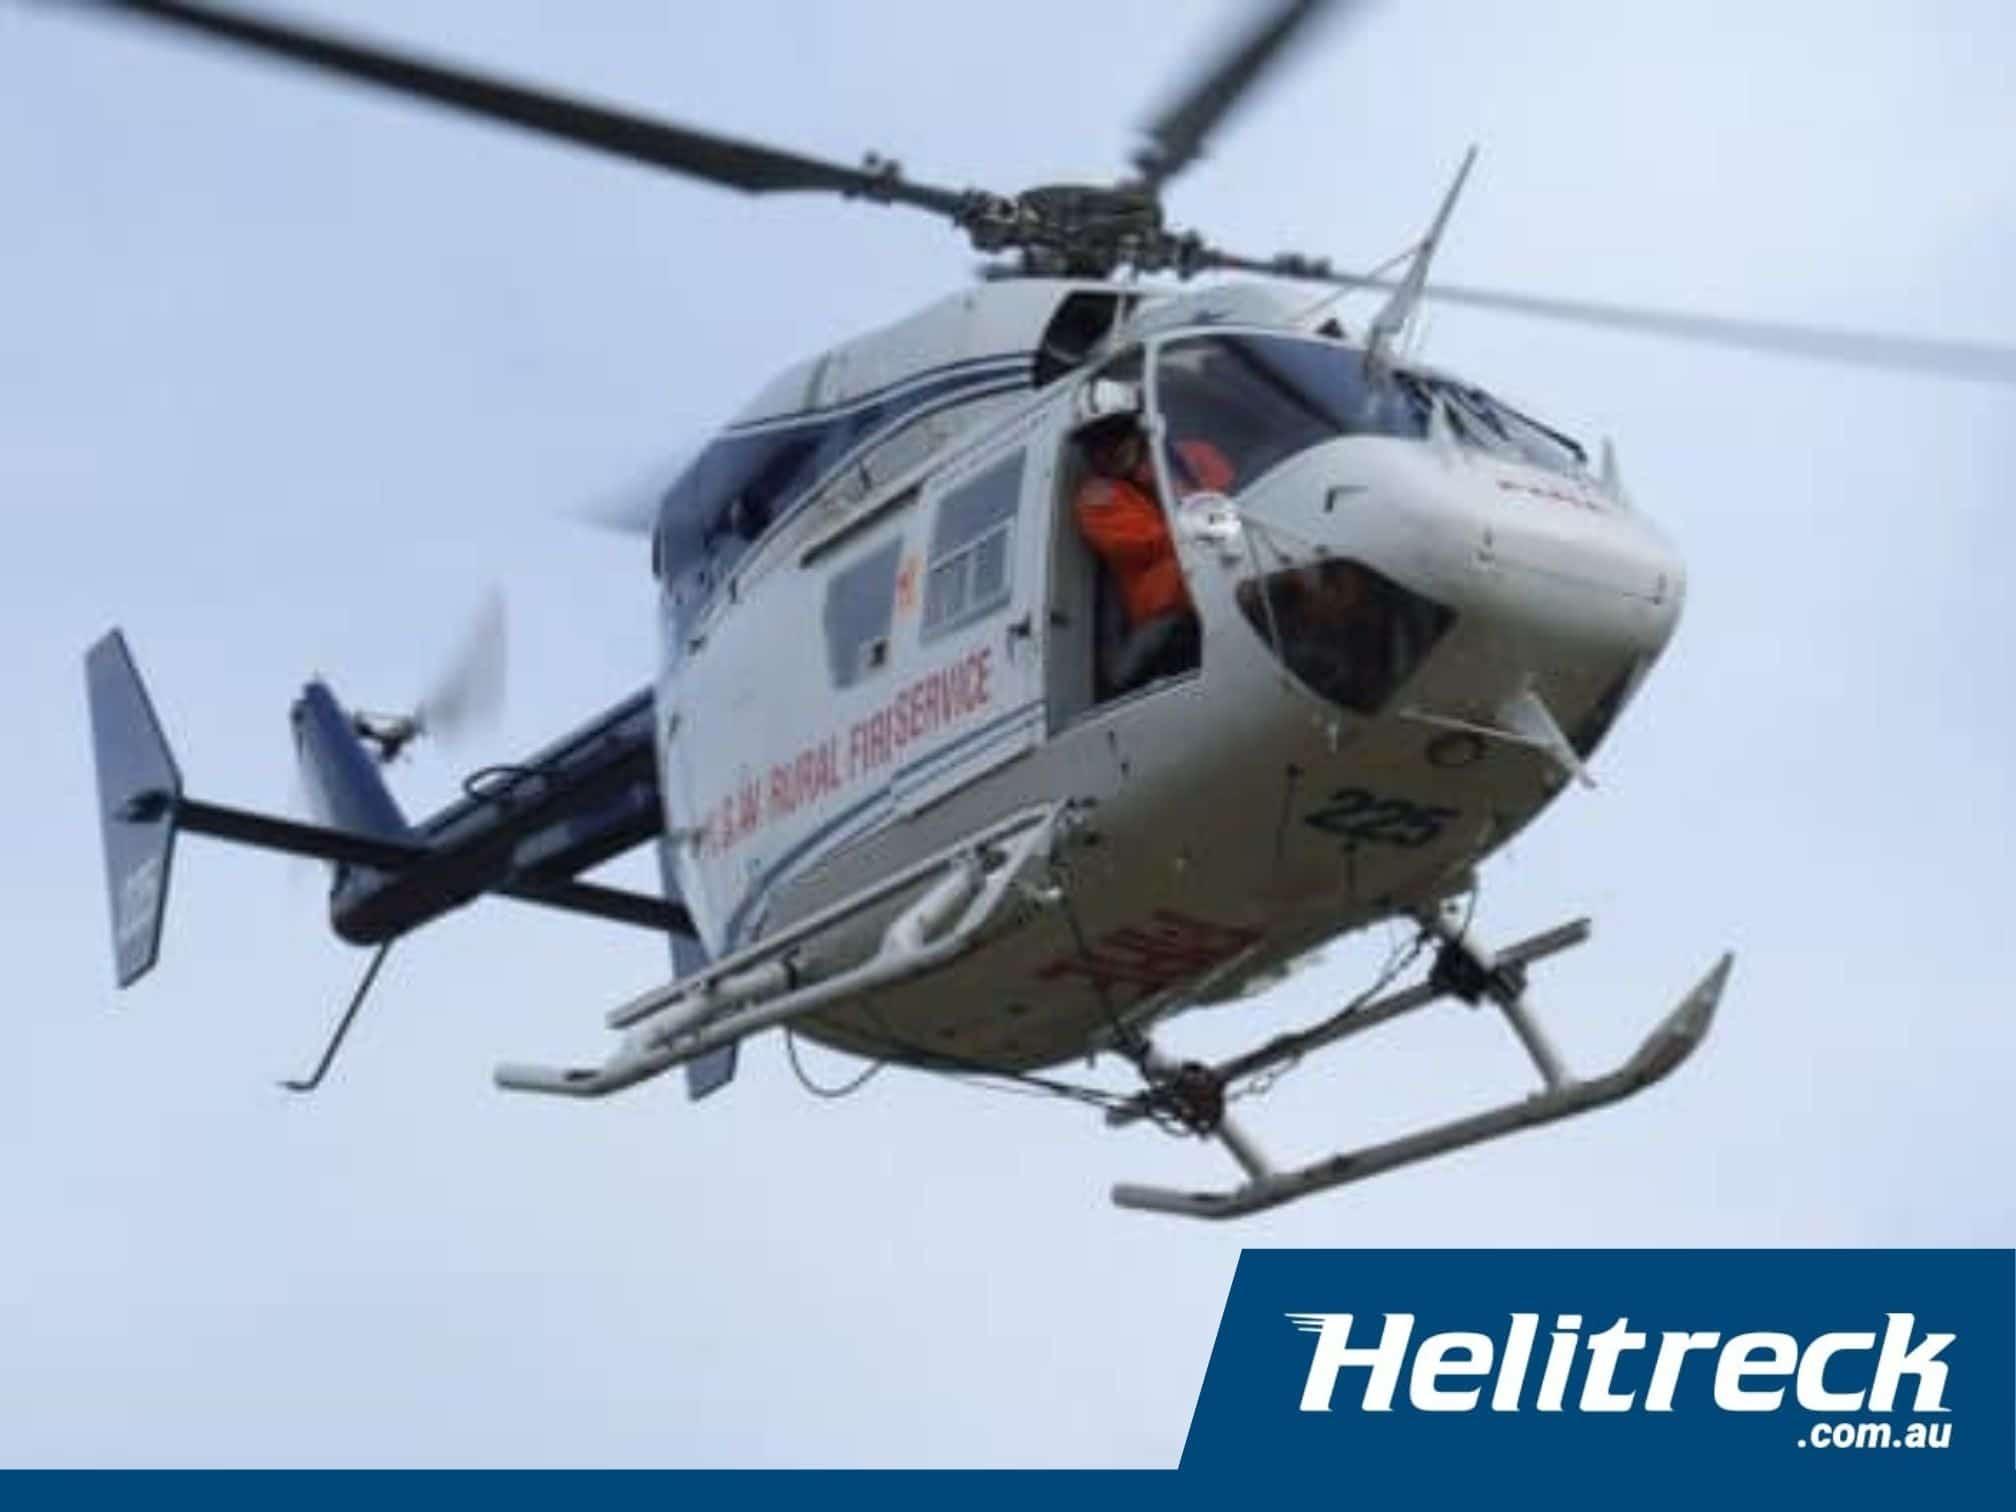 Helitreck-Helicopters-Sydney-Australia